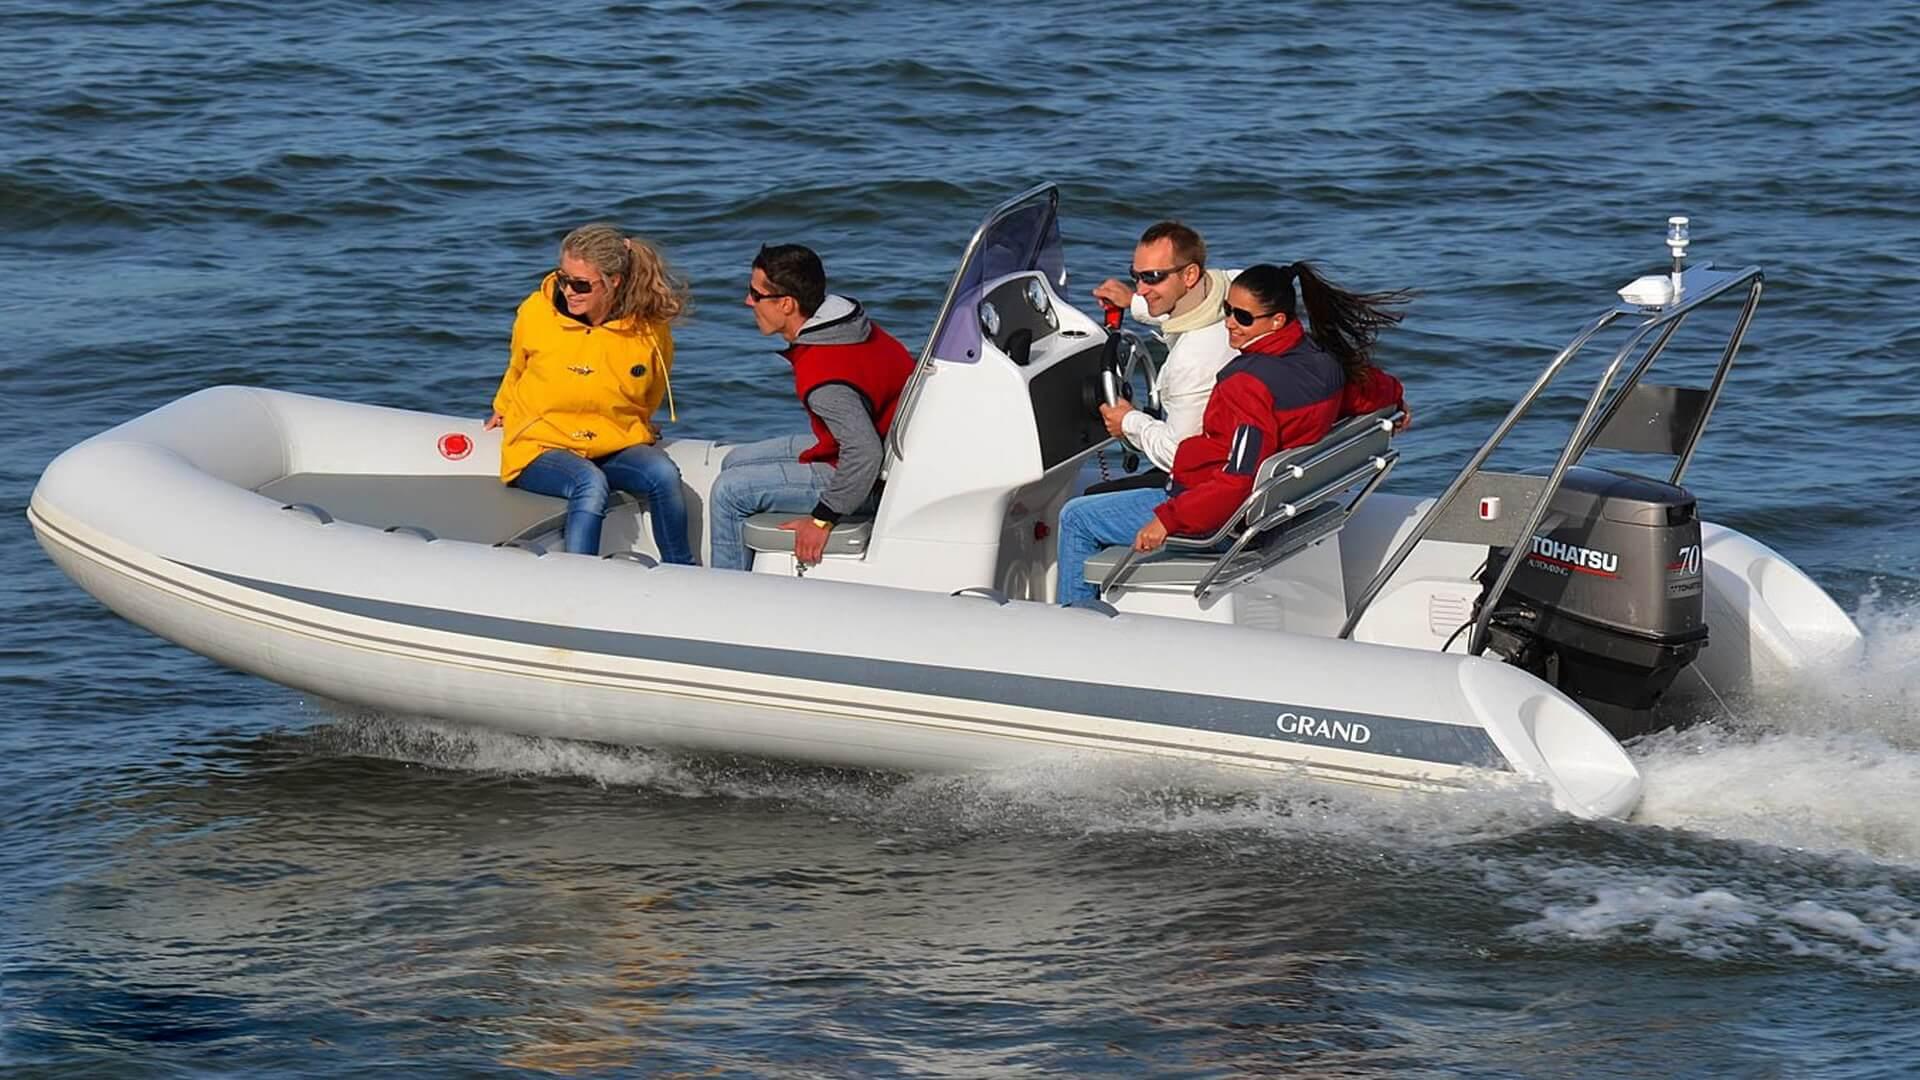 Надувная лодка с жестким дном GRAND Silver Line S520L, Надувная лодка GRAND Silver Line S520LF, GRAND Silver Line S520L, GRAND Silver Line S520LF, GRAND S520L, GRAND S520LF, GRAND S520, Надувная лодка GRAND, Надувная лодка ГРАНД, Надувная лодка с жестким дном, RIB, Rigid Inflatable Boats